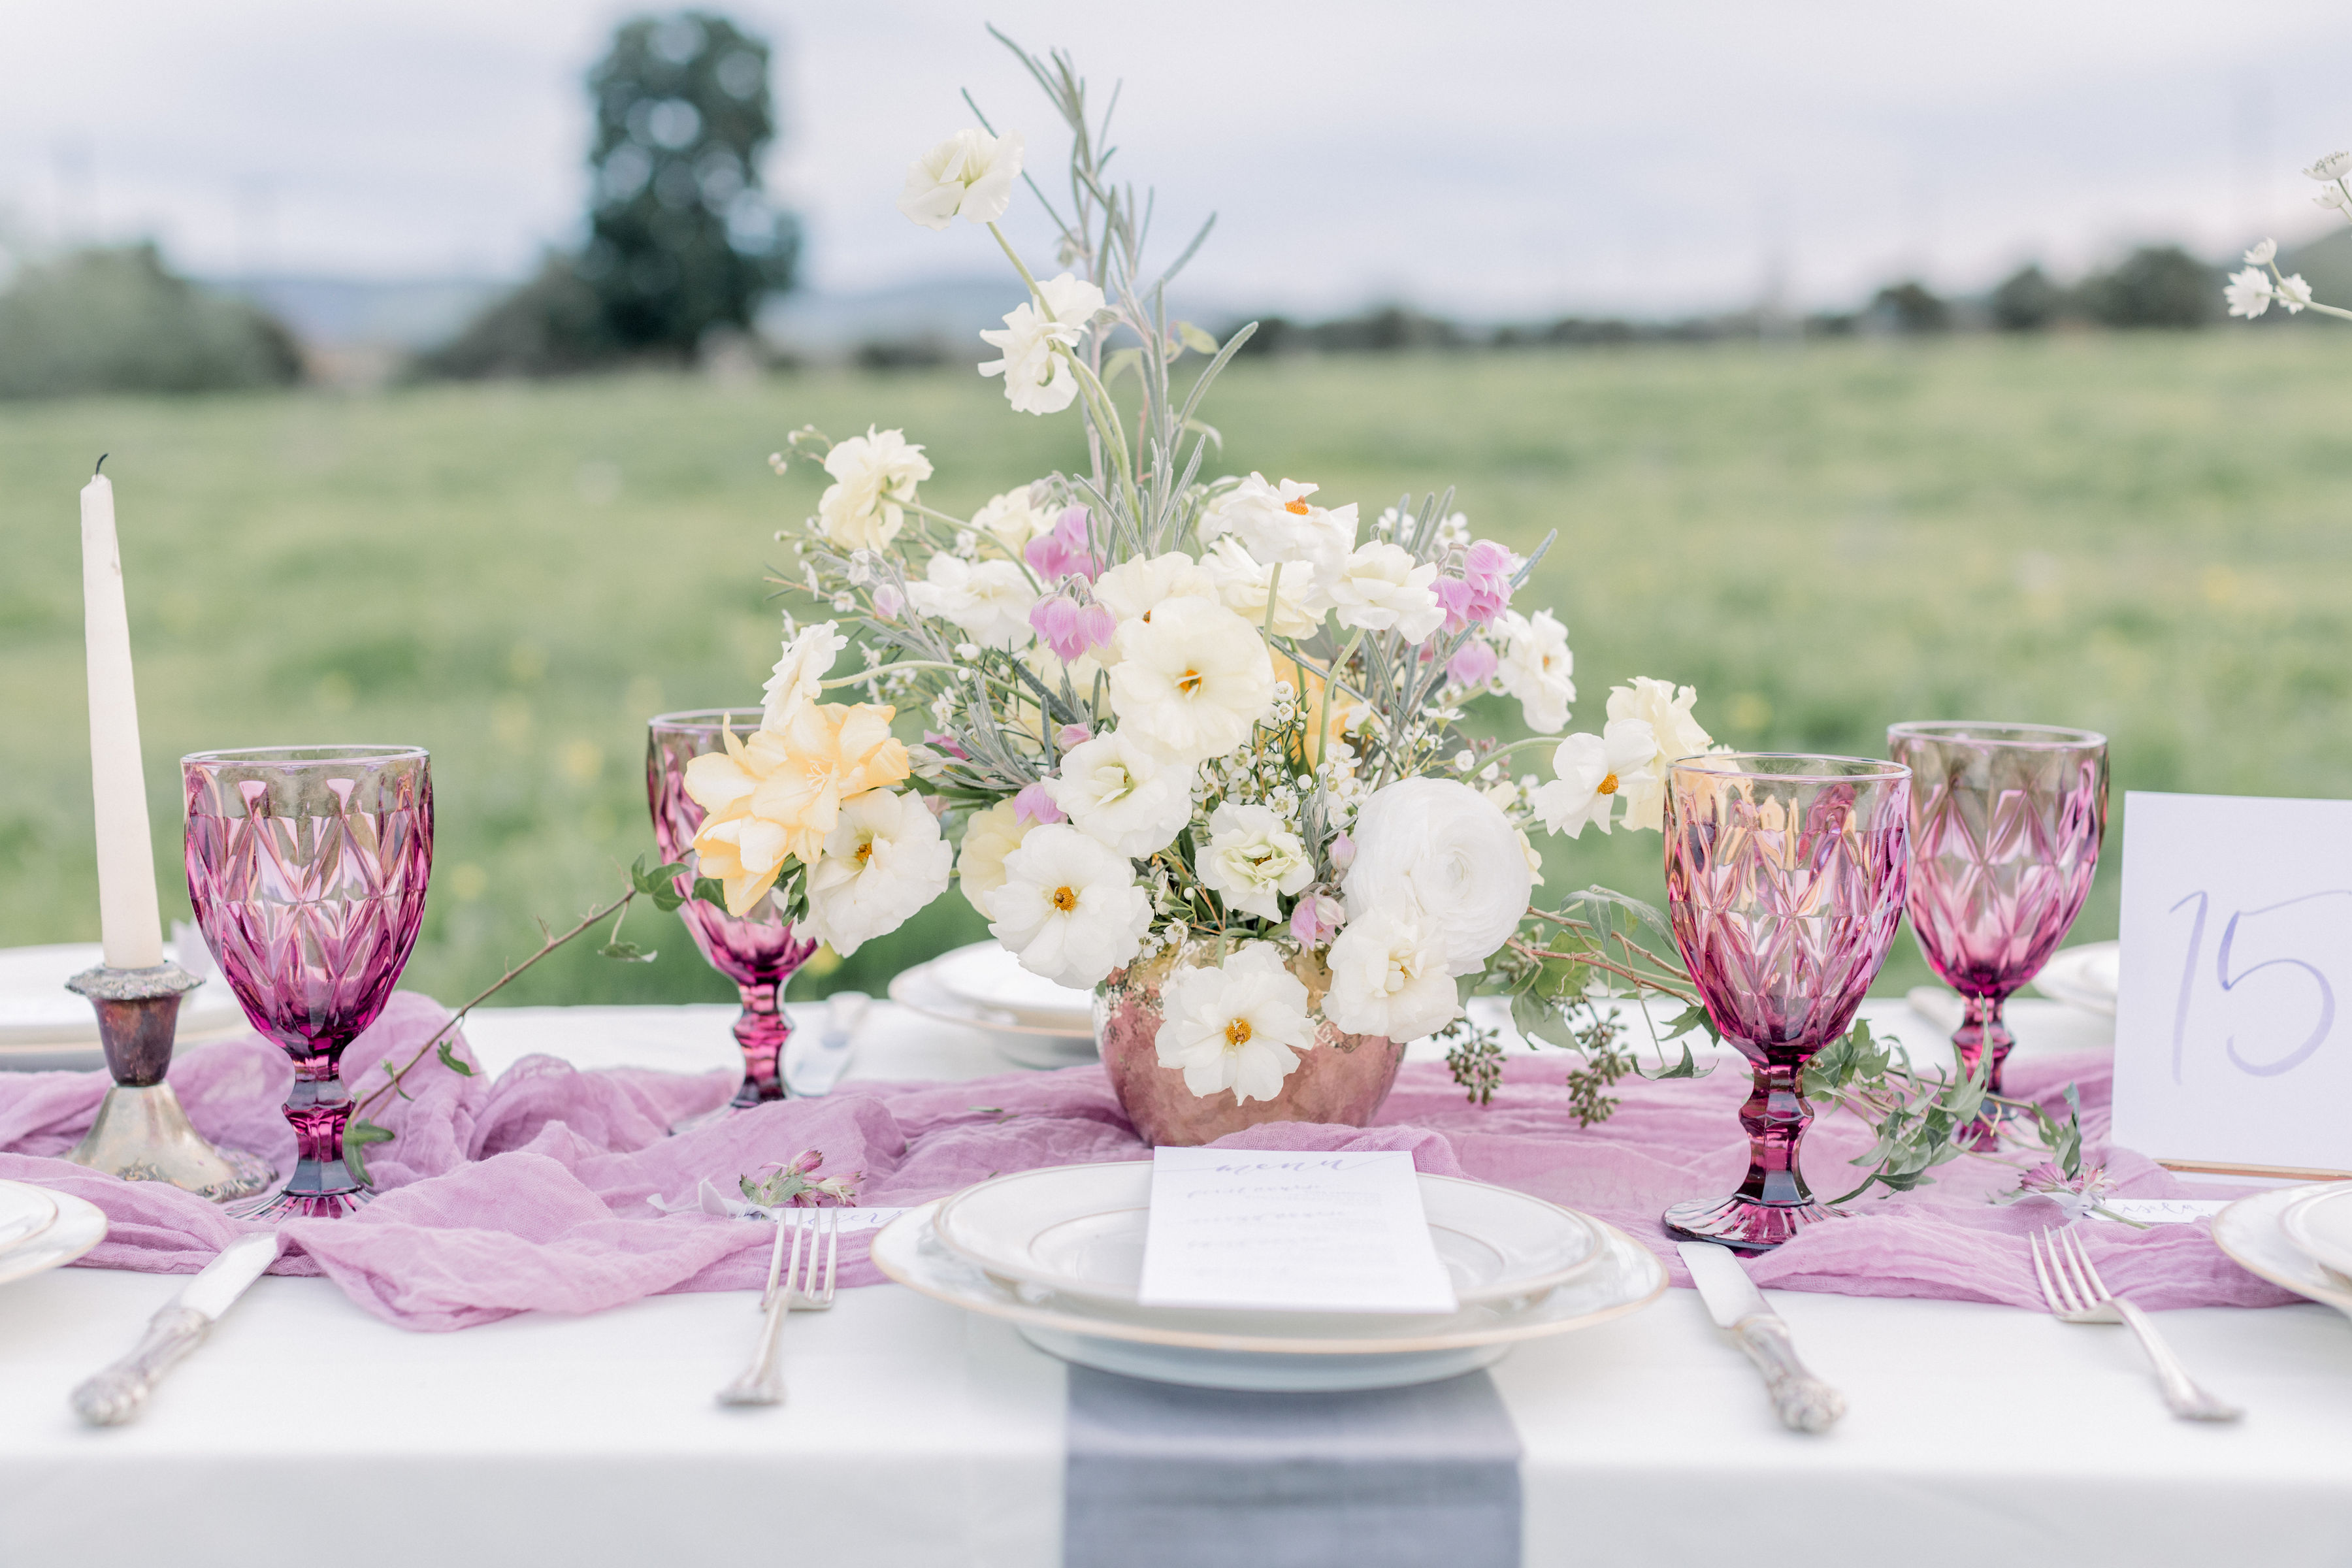 StephanieWeberPhotography-Purple Wedding tablescape – Bloom Theory centerpiece